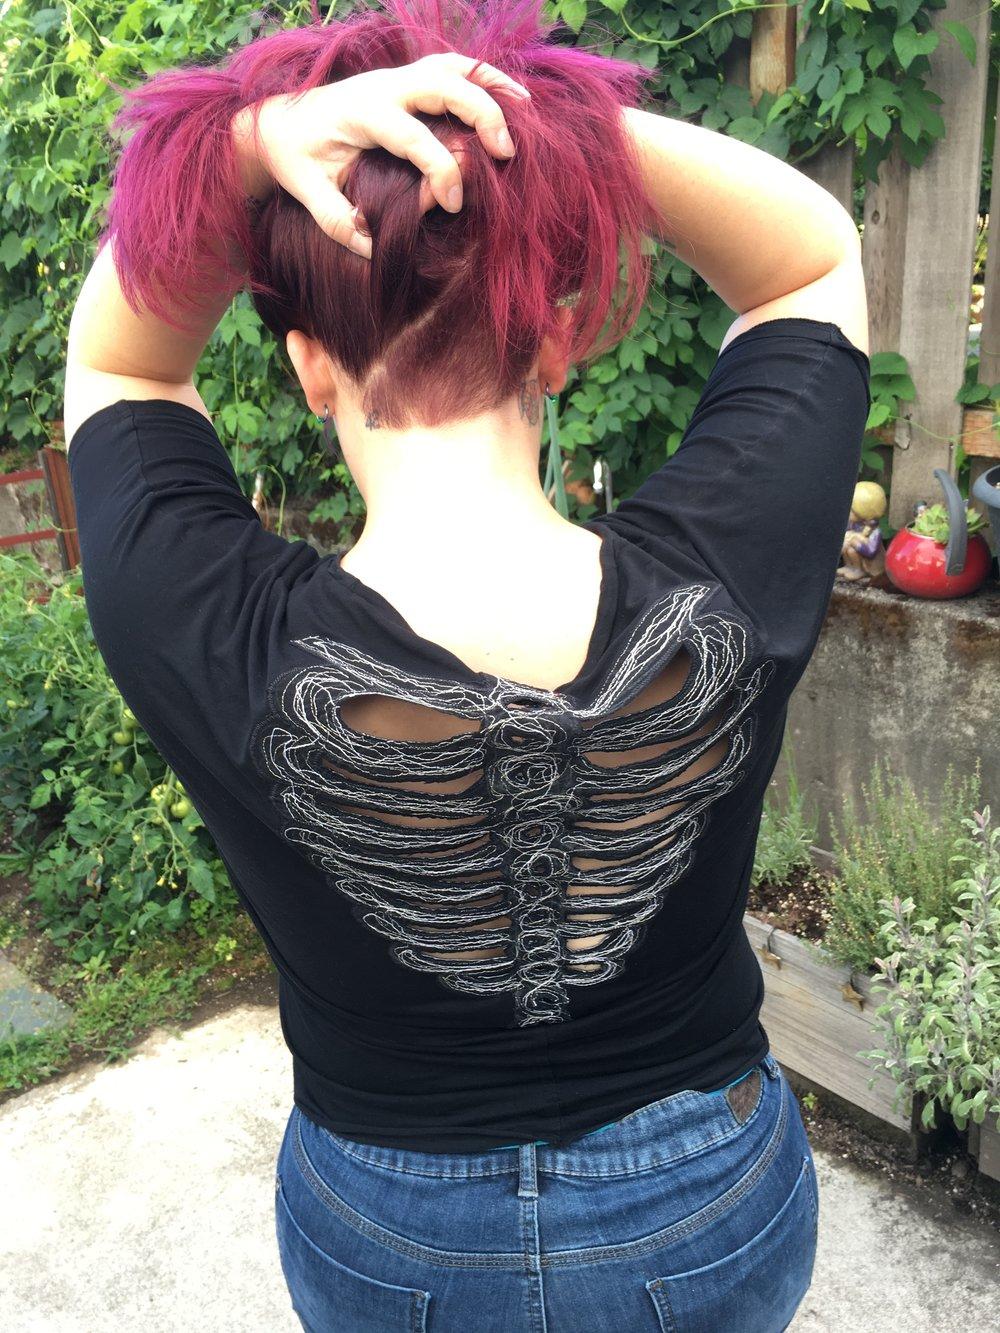 Ribcage cutout t-shirt modification